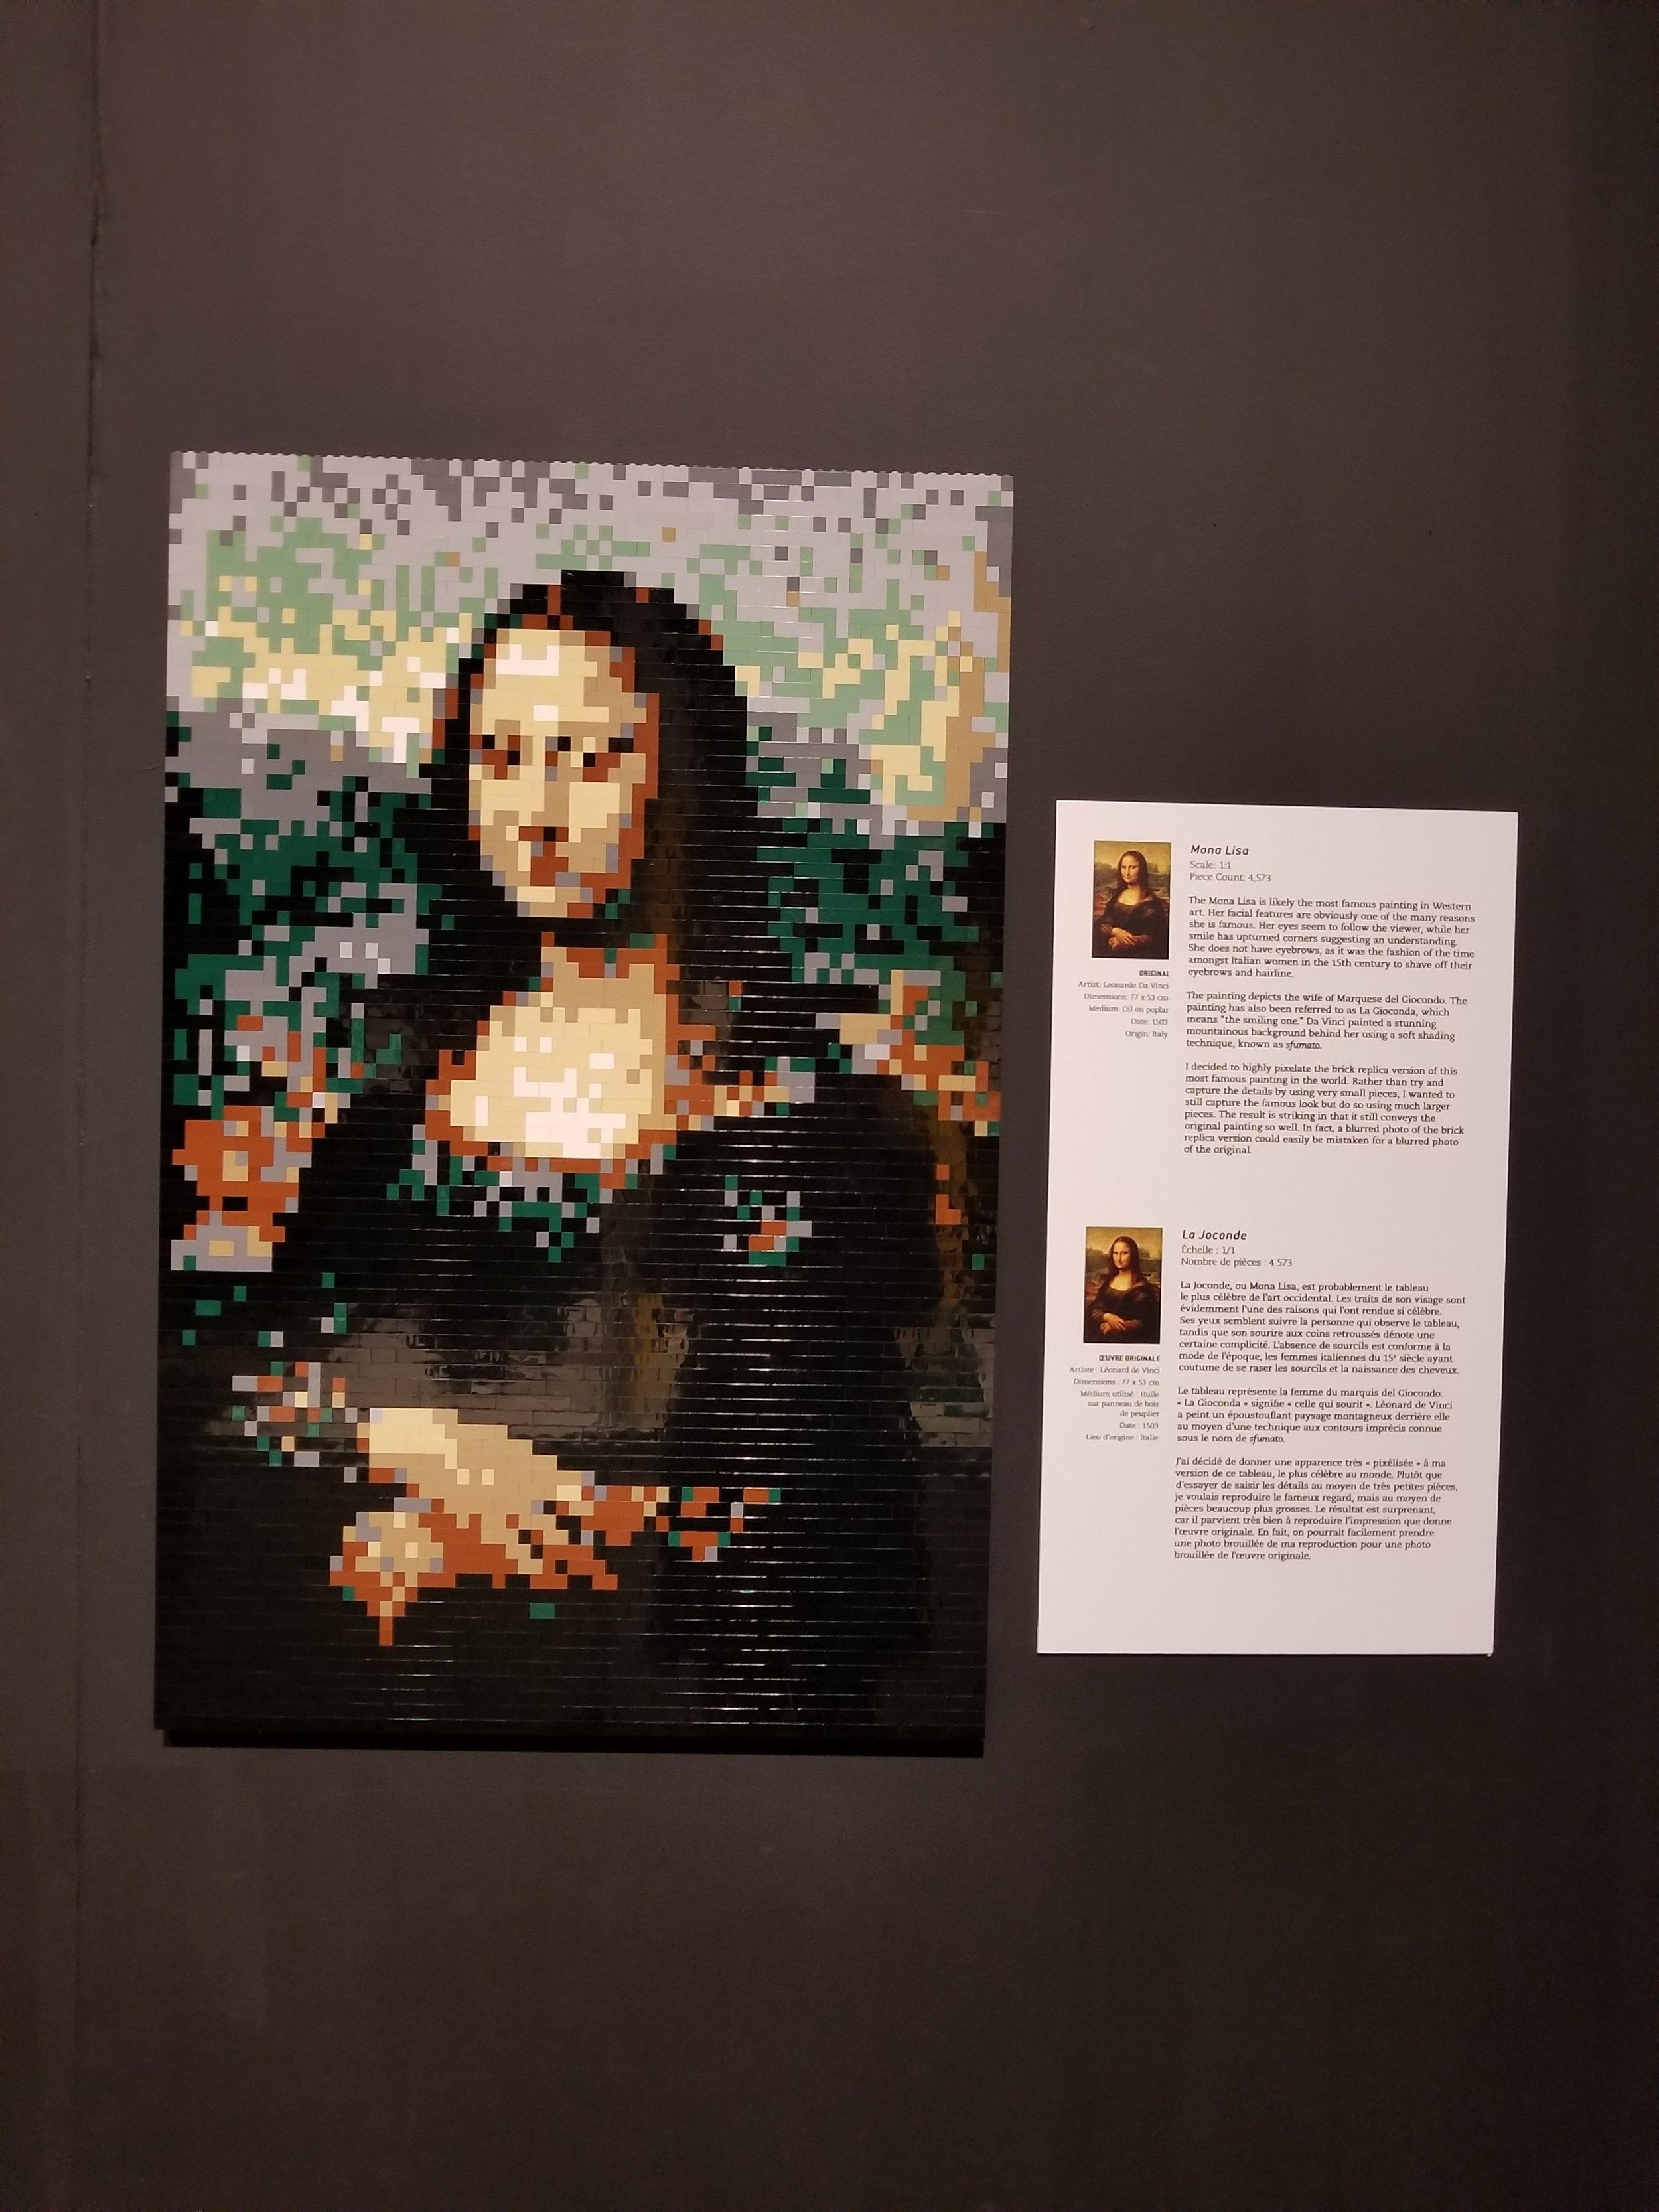 Mona Lisa - Da Vinci